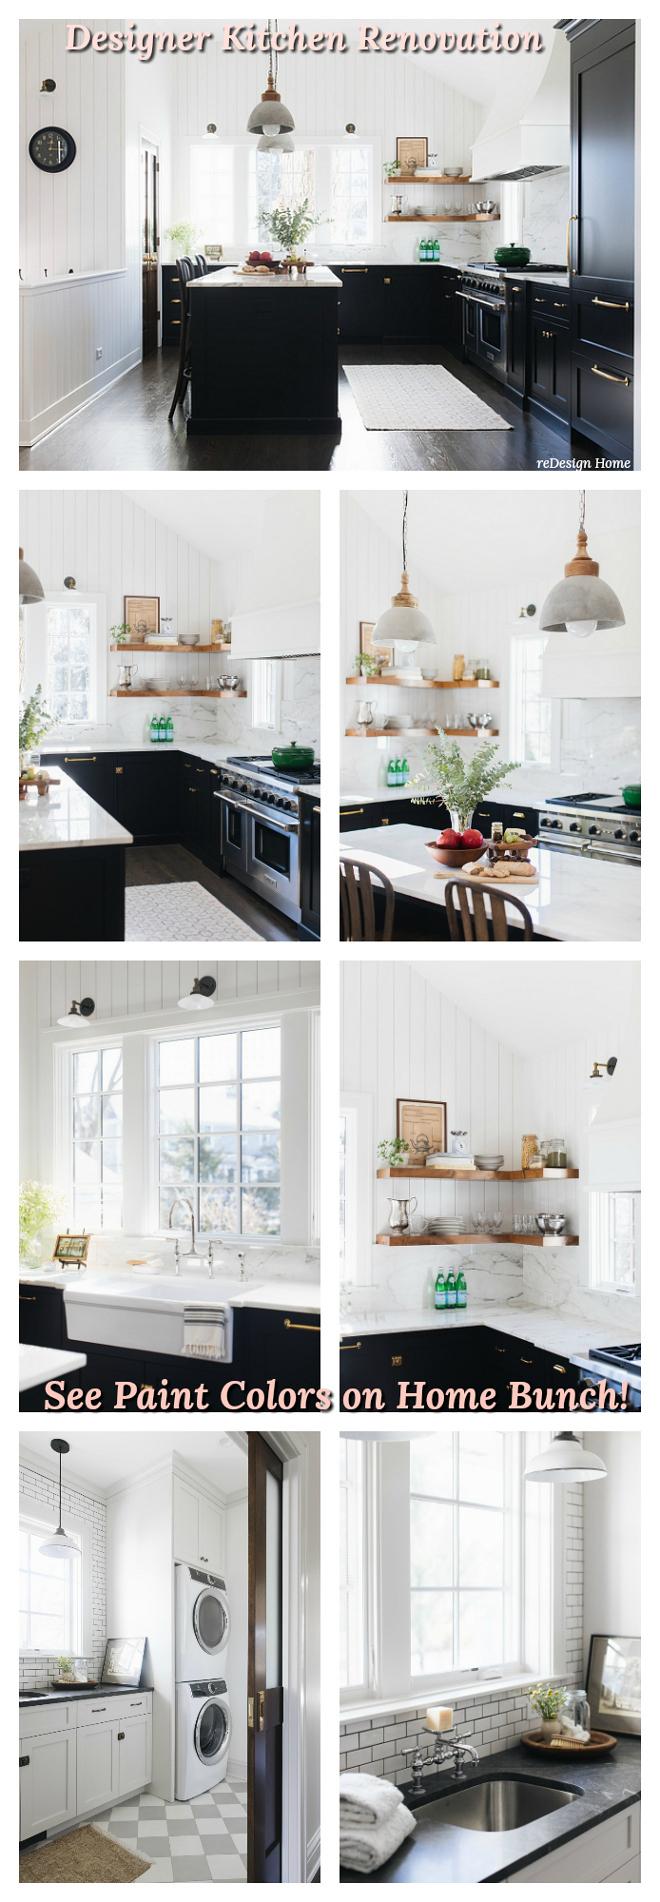 Designer Kitchen Renovation Designer Kitchen Renovation Paint Colors Designer Kitchen Renovation #DesignerKitchenRenovation #KitchenRenovation